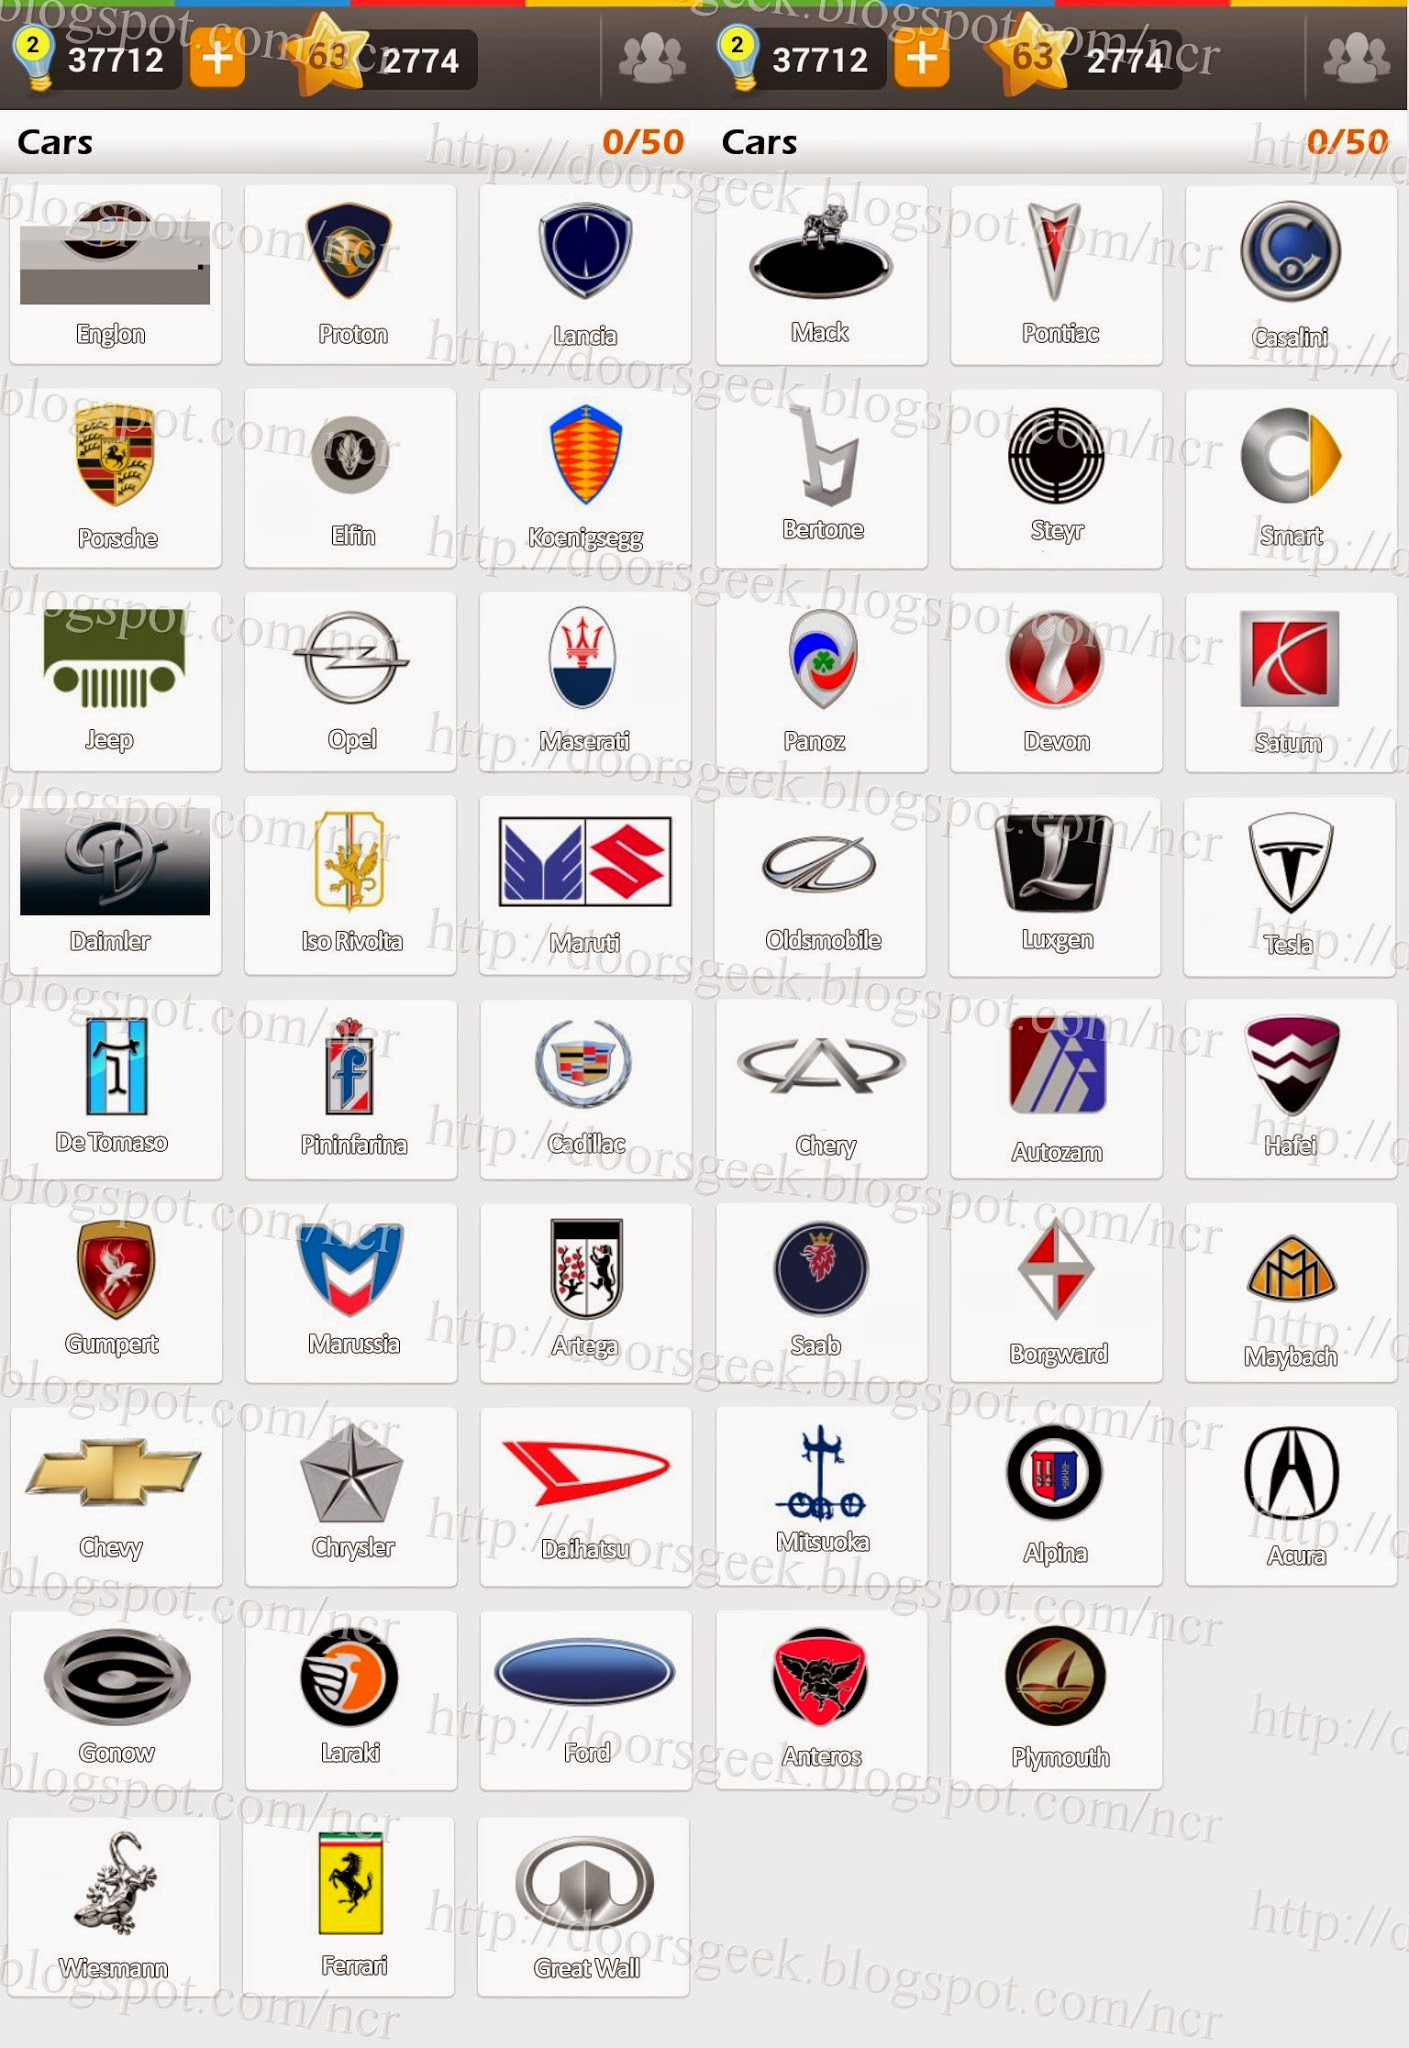 Logo Game: Guess the Brand [Bonus] Cars ~ Doors Geek.